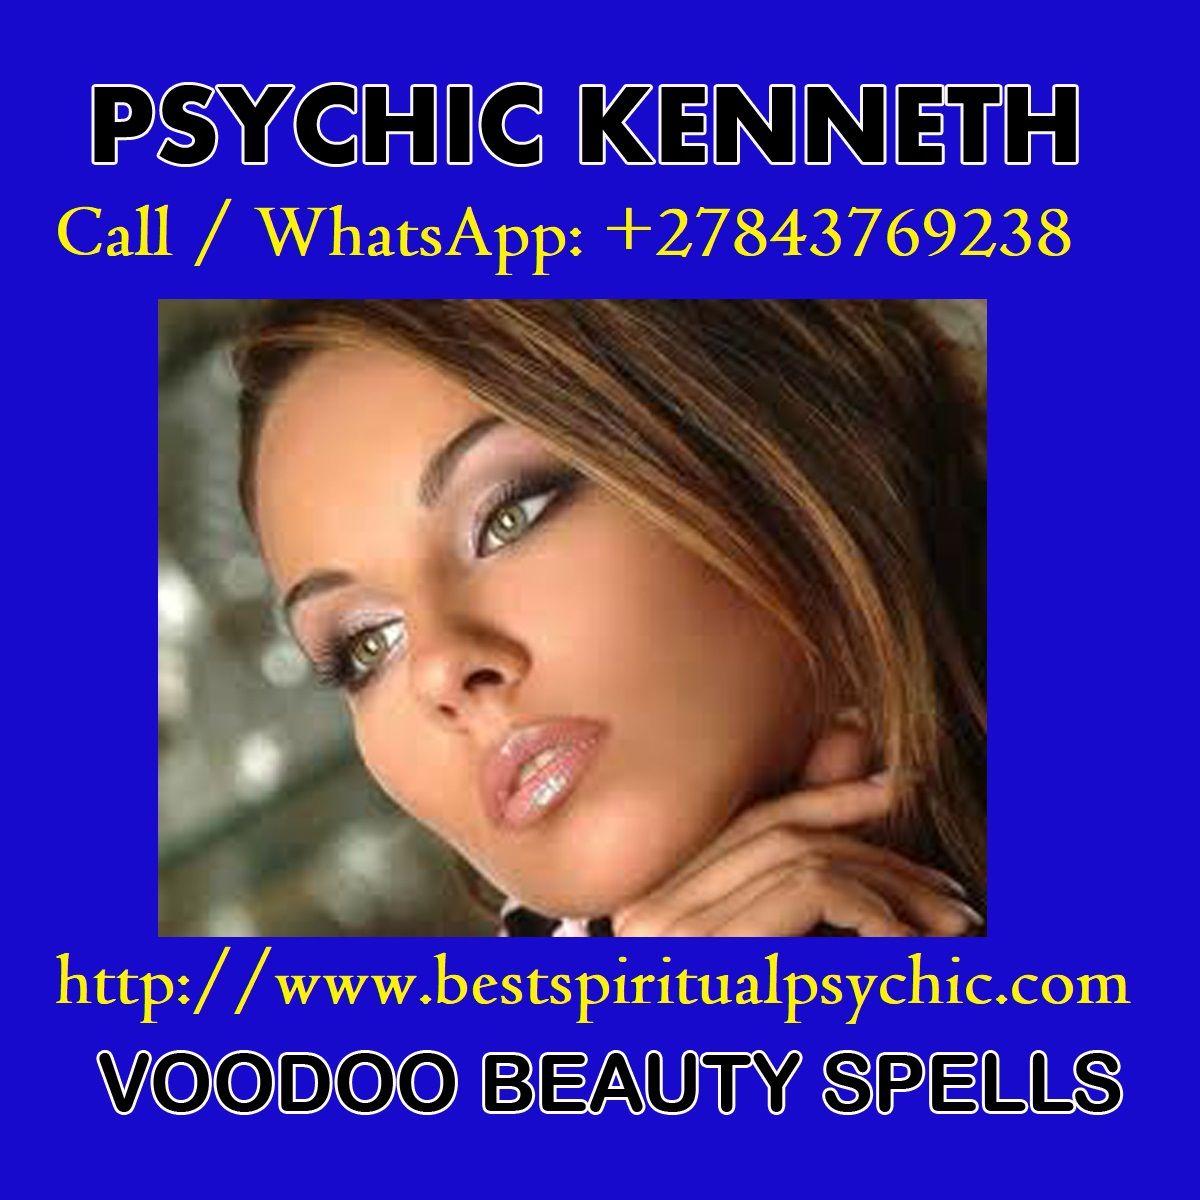 Beauty Spells Truth Love Spell Call Whatsapp 27843769238